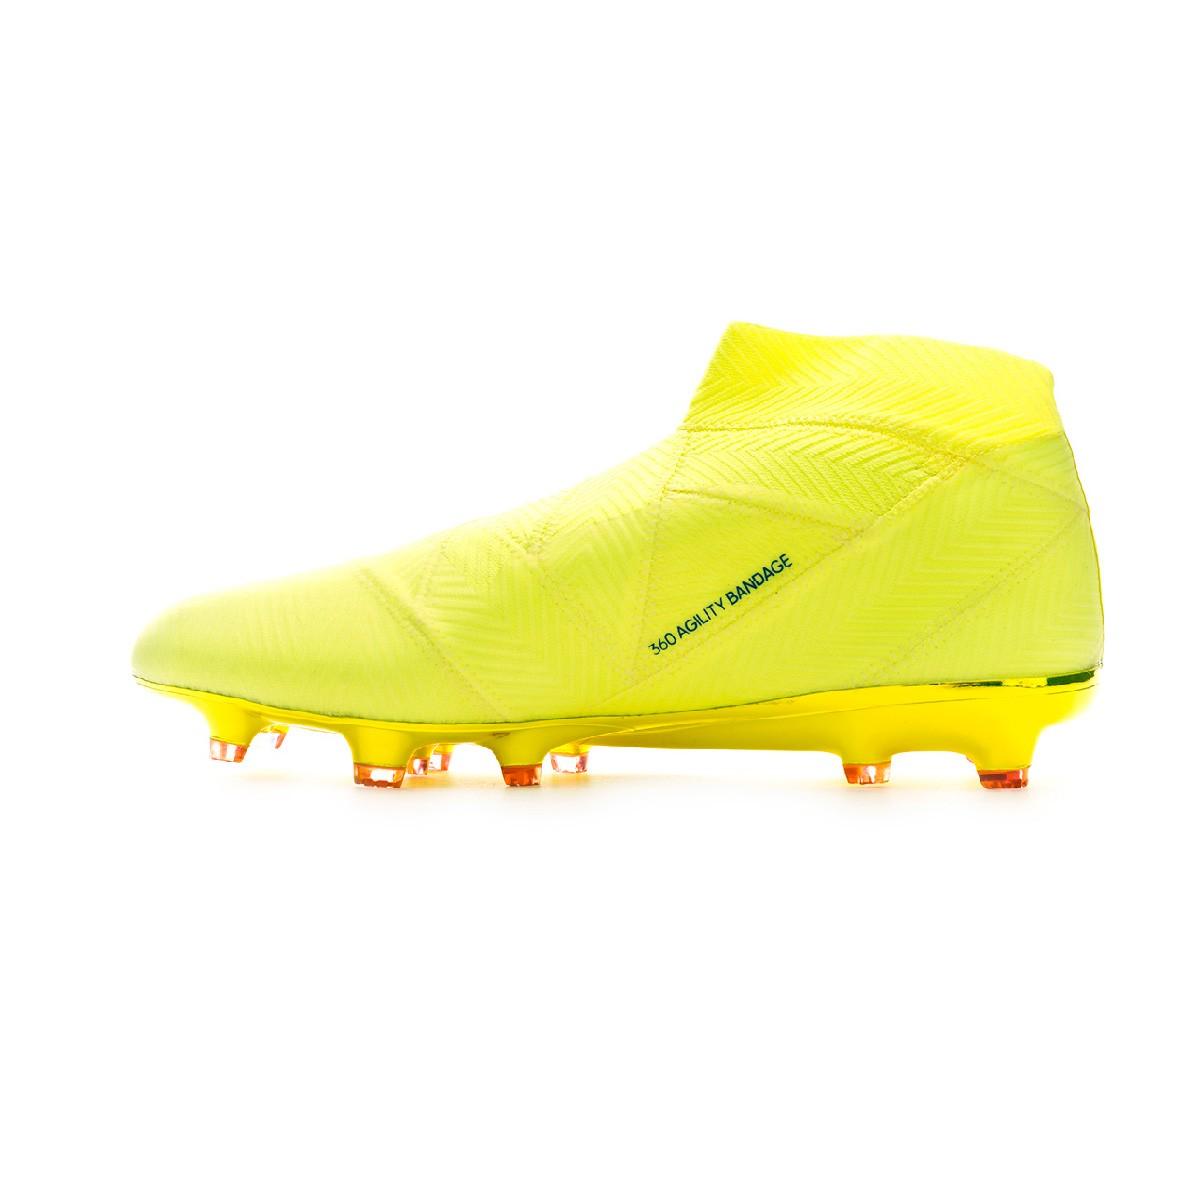 6e5868be943b9 Scarpe adidas Nemeziz 18+ FG Solar yellow-Football blue-Active red -  Negozio di calcio Fútbol Emotion